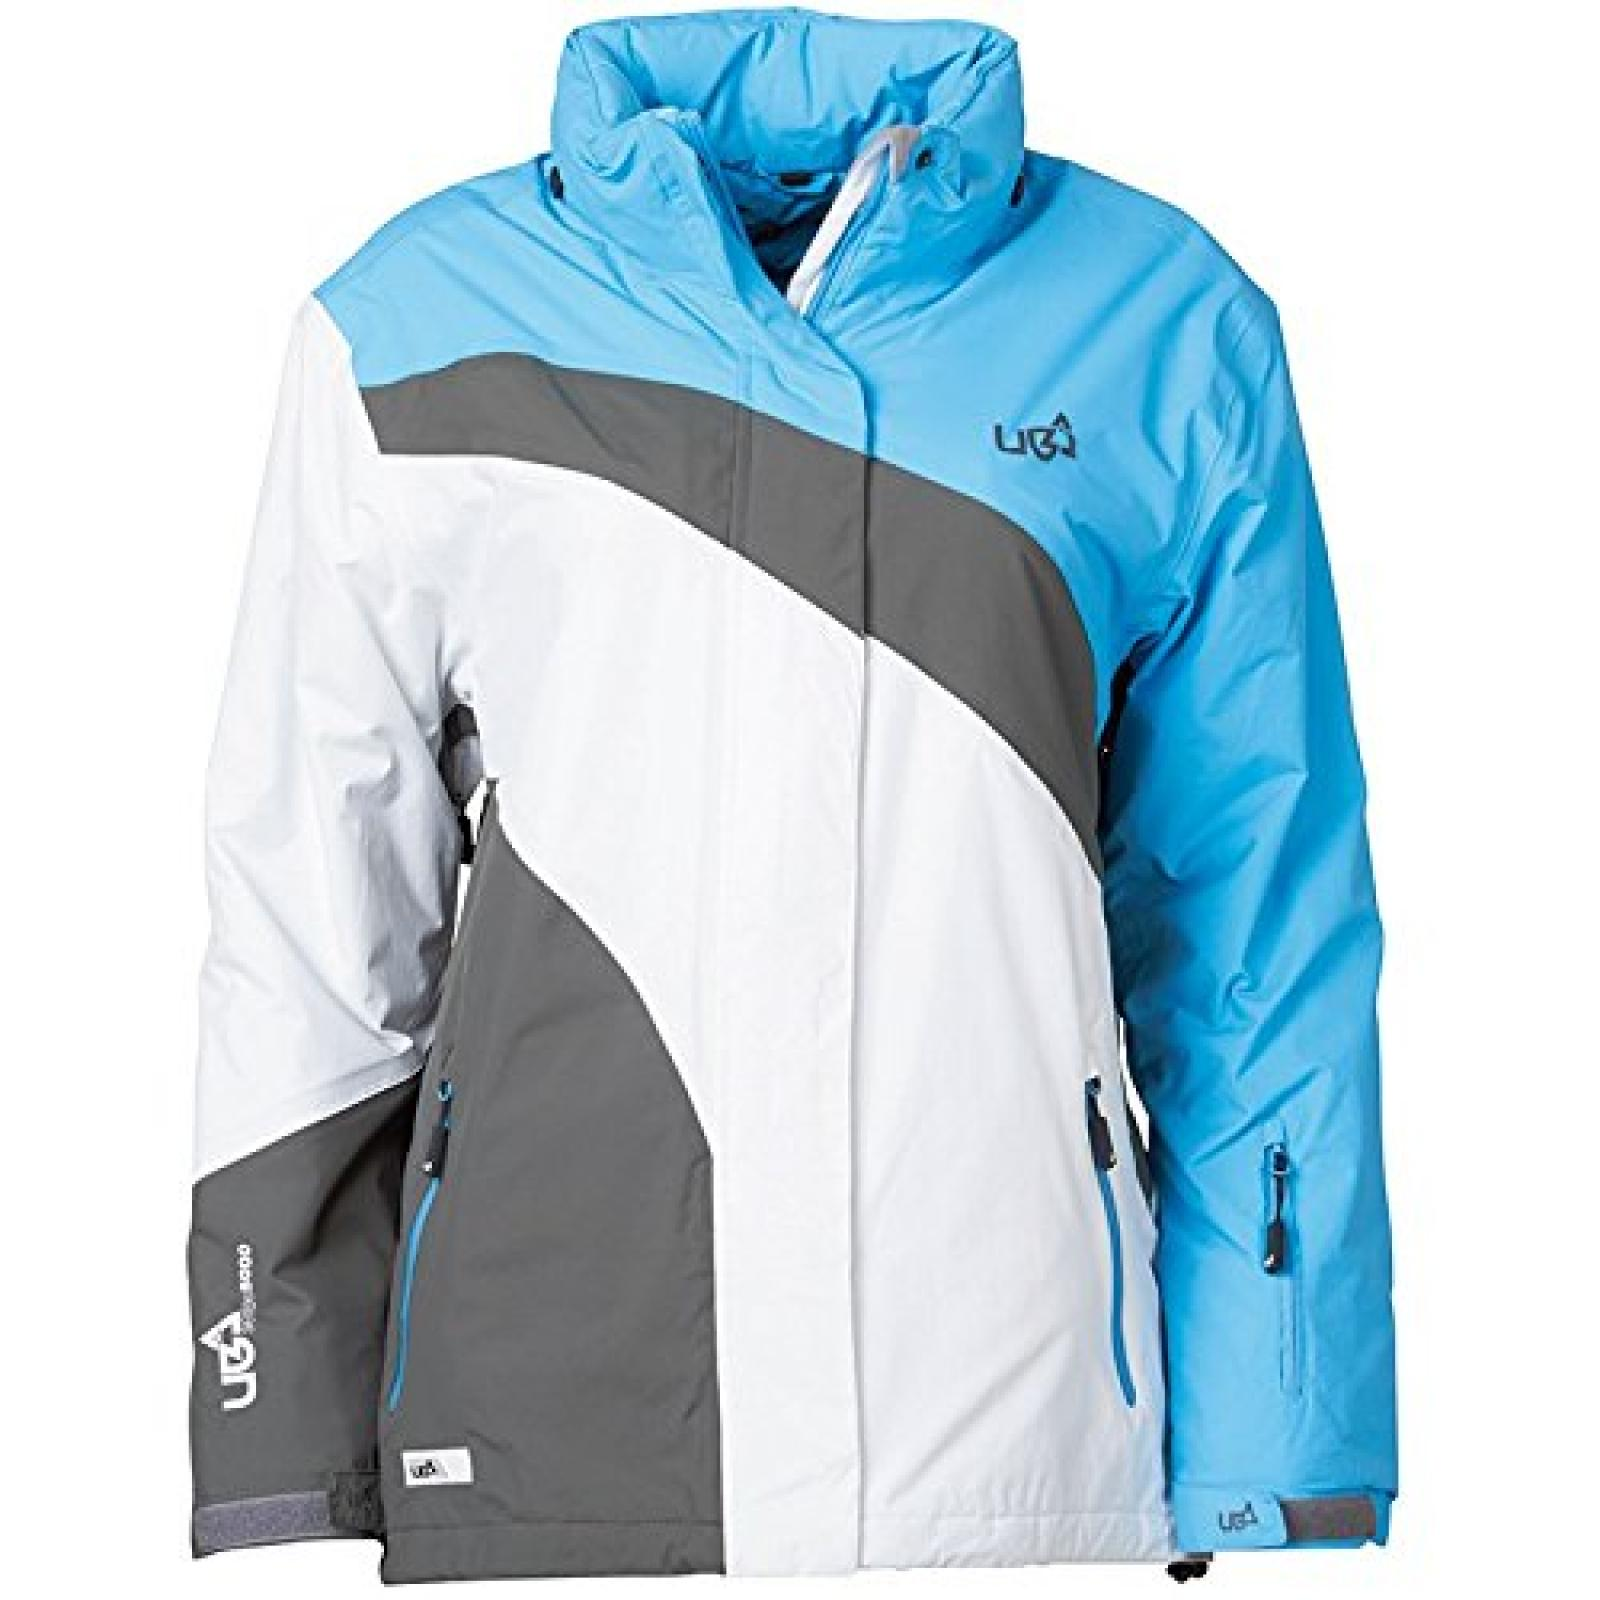 Blau/Grau/Weiß Urban Beach Damen 5000/5000 Tech Jacke Blau/Grau/Weiß